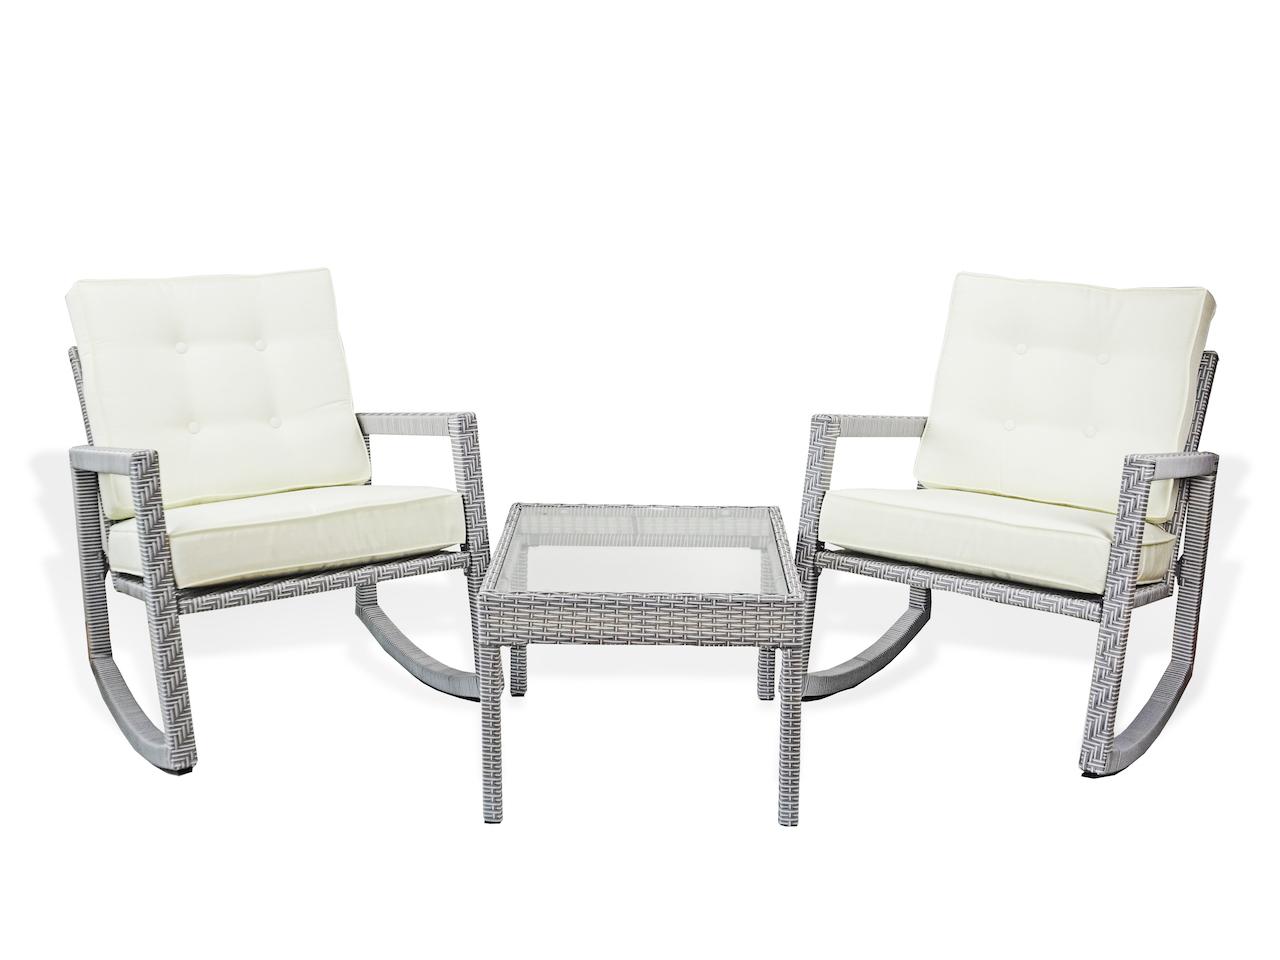 Buy Patio 3pc Lounge Set rocking chairs and coffee